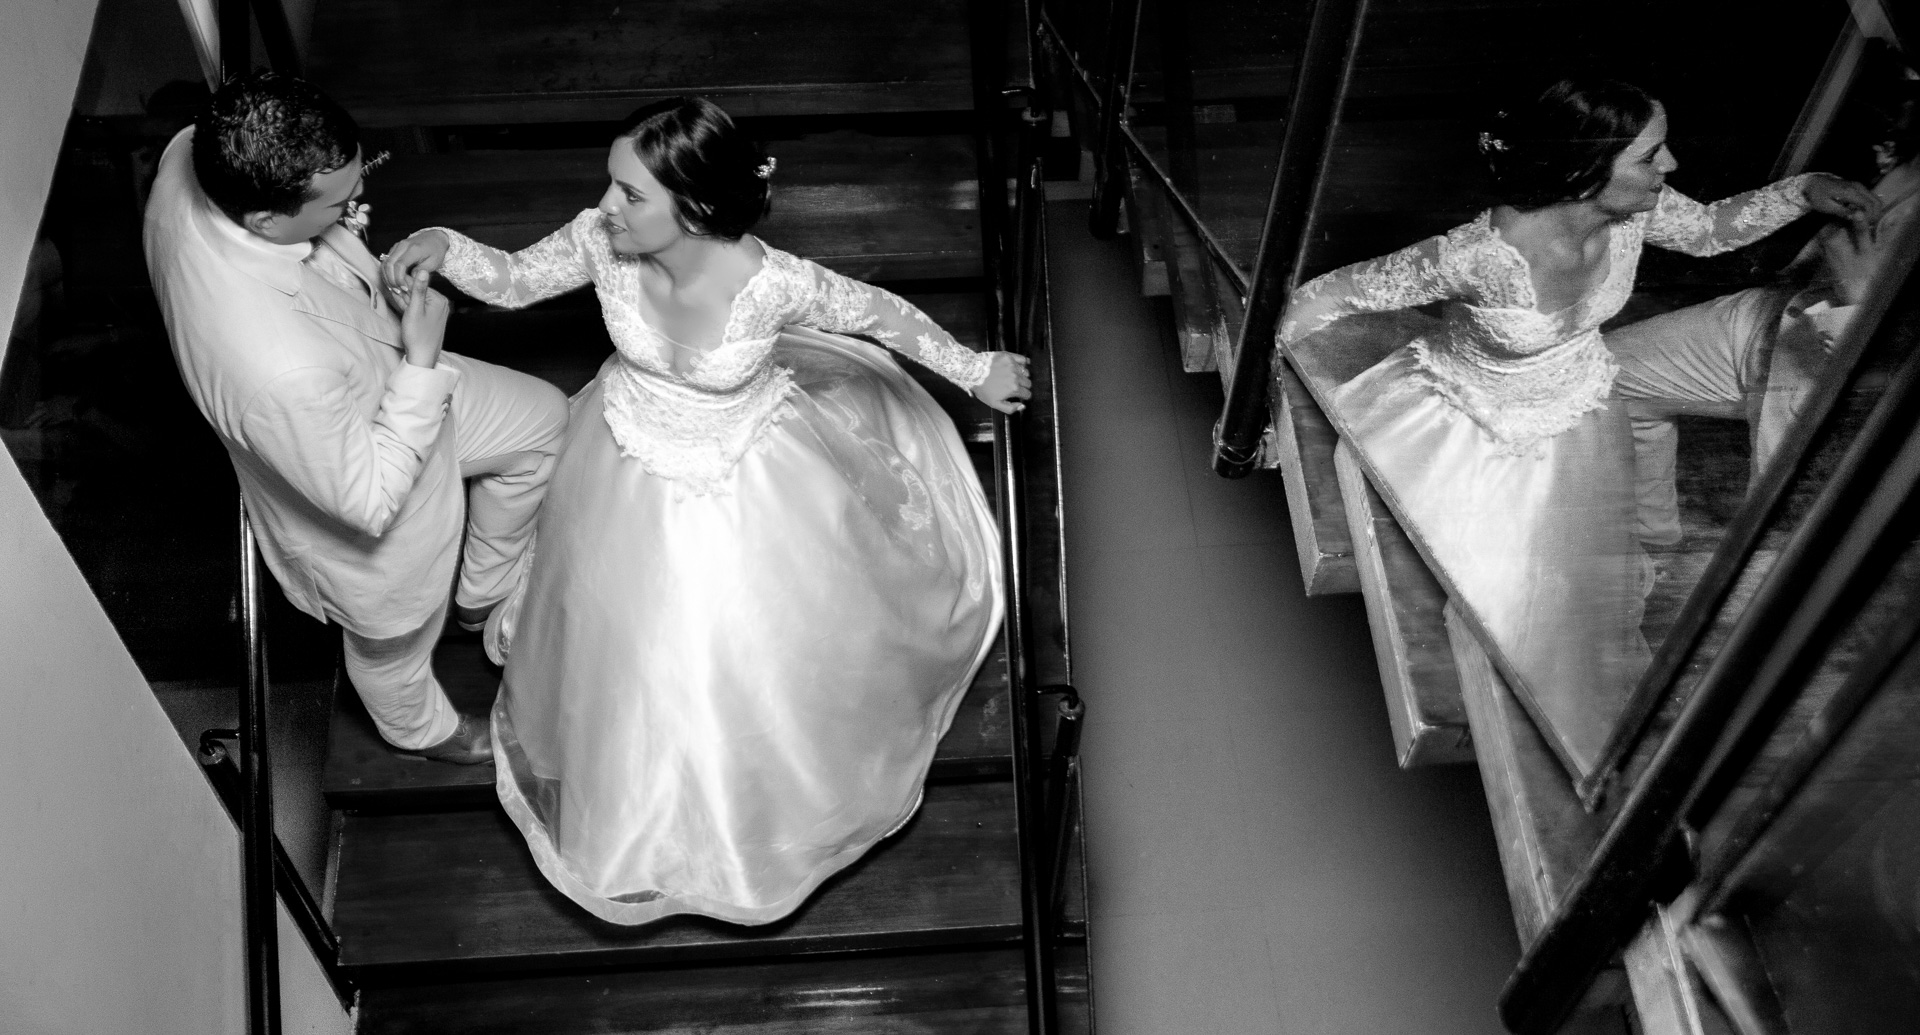 Fotógrafos-de-bodas-en-Colombia-Sthephanie-y-David-47 STEPHANIE + DAVID